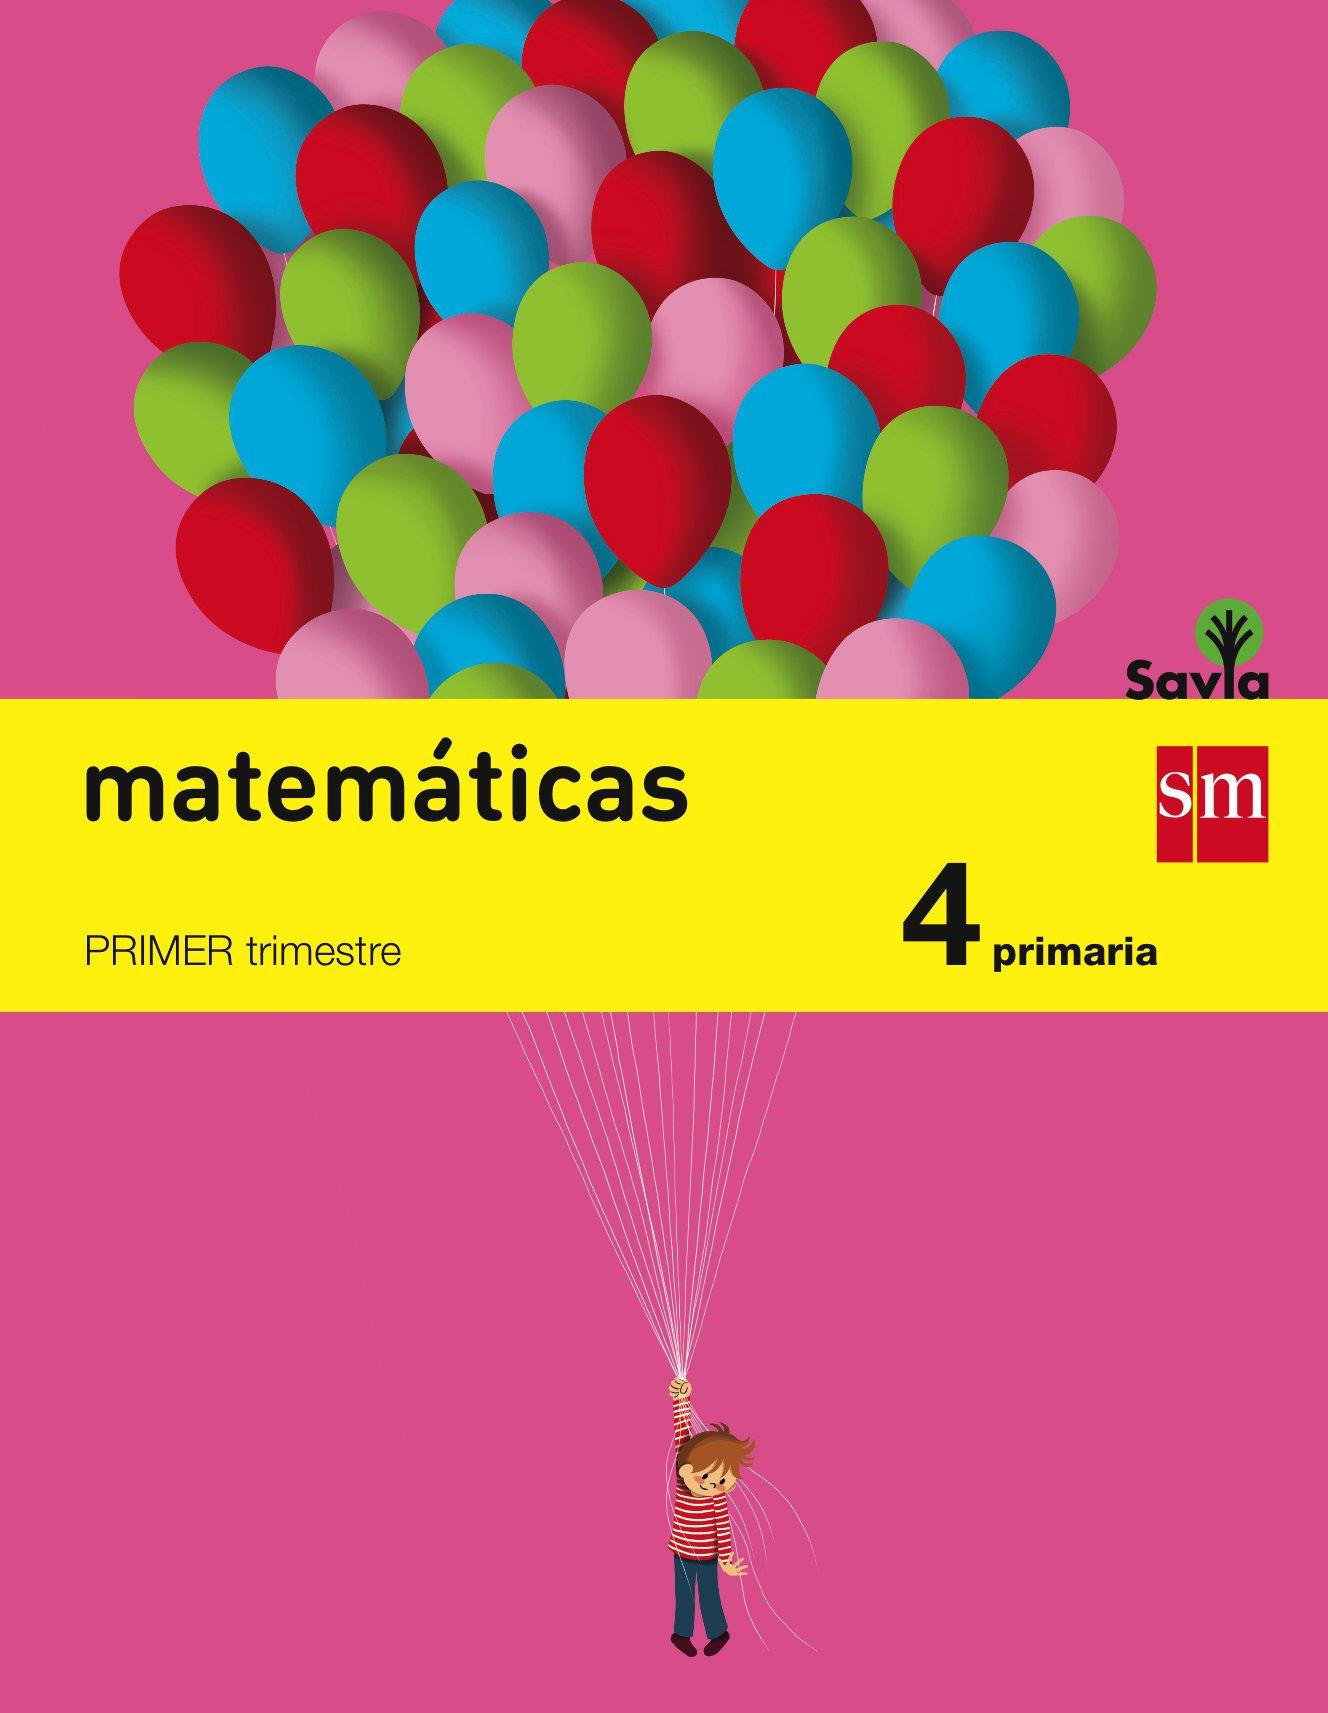 Matemáticas. 4 Primaria. Savia - Pack de 3 libros - 9788467575408 Tapa blanda – 1 may 2015 Javier Bernabeu Ruiz Mercedes Garín Muñoz Paloma Sánchez Ibarzábal María Nila Pérez Francisco